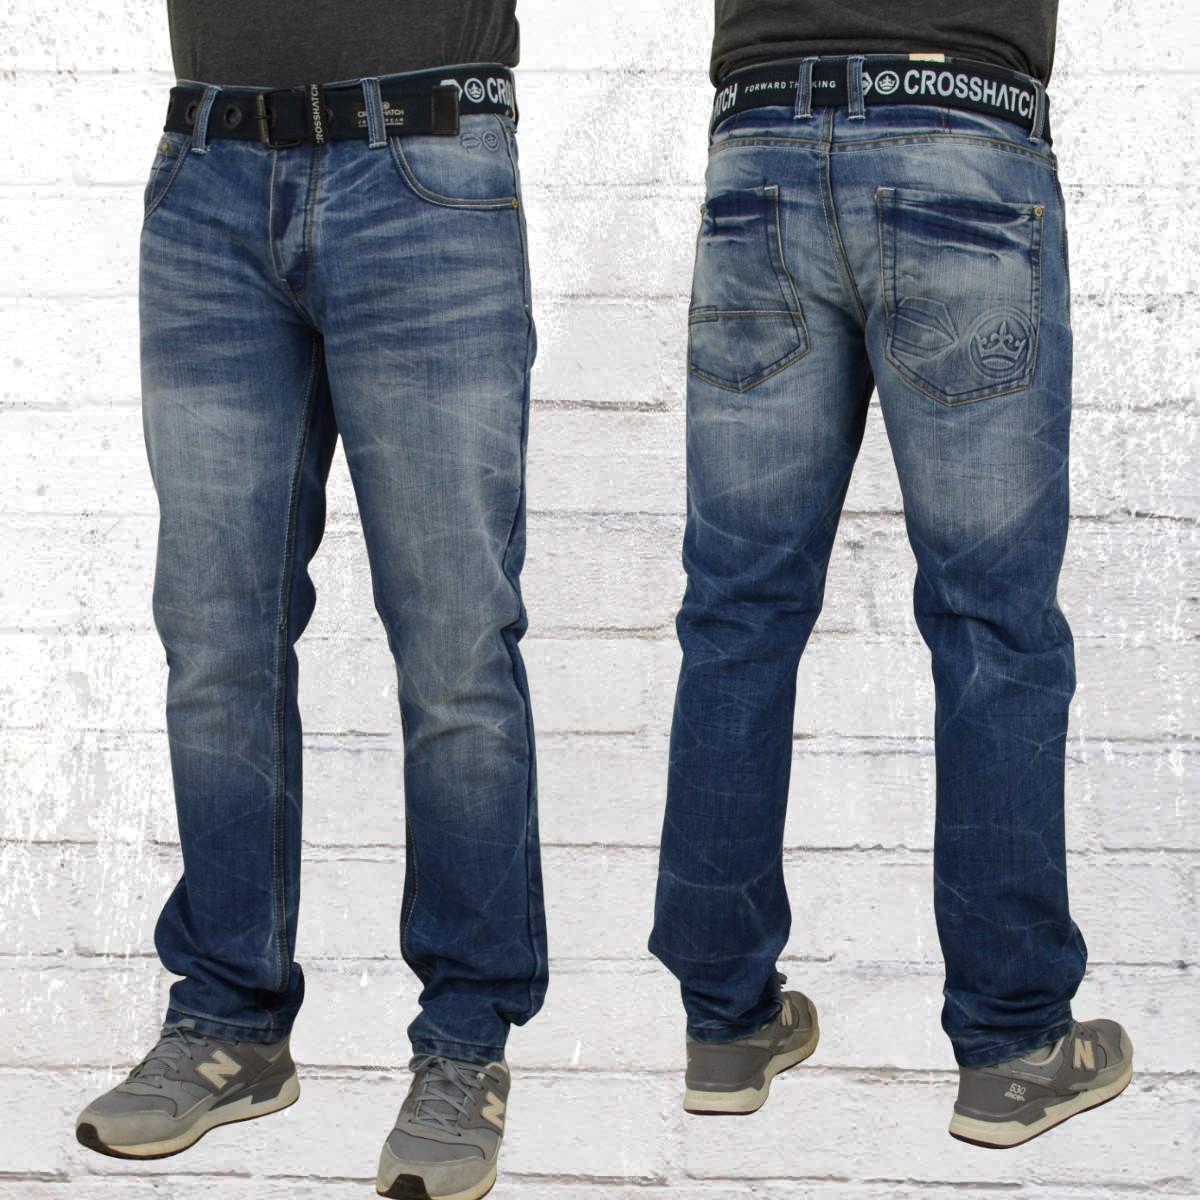 jetzt bestellen cross hatch herren jeans hose new embossed blau krasse. Black Bedroom Furniture Sets. Home Design Ideas